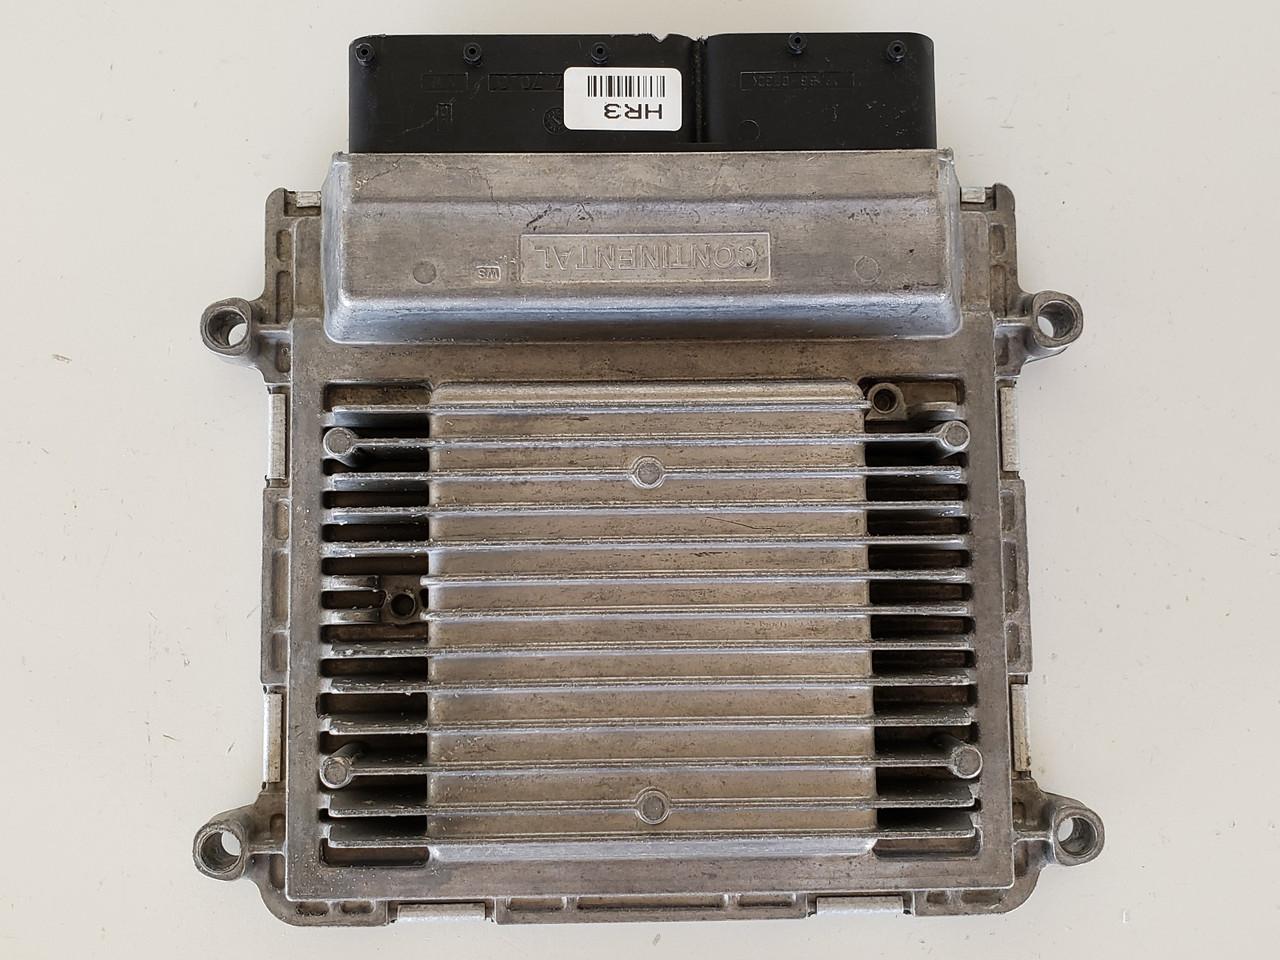 2010-2013 Sportage 39107-2G692 Computer Brain Engine Control ECU ECM EBX Module